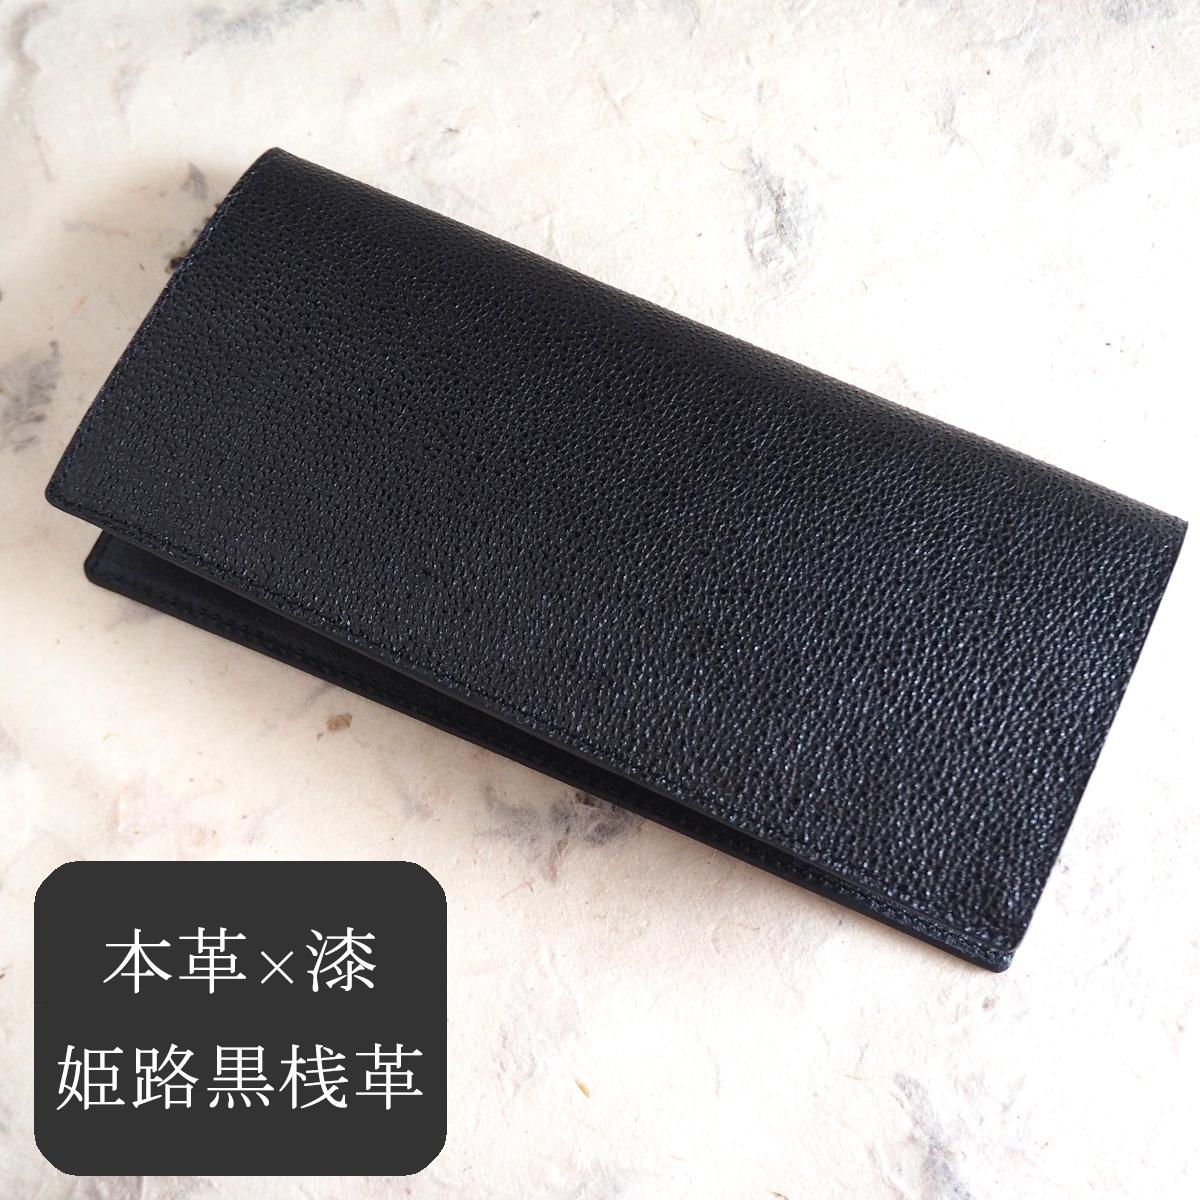 COTOCUL(コトカル) 長財布 黒桟革(くろざんがわ) ブラック [KCW0002-BK]